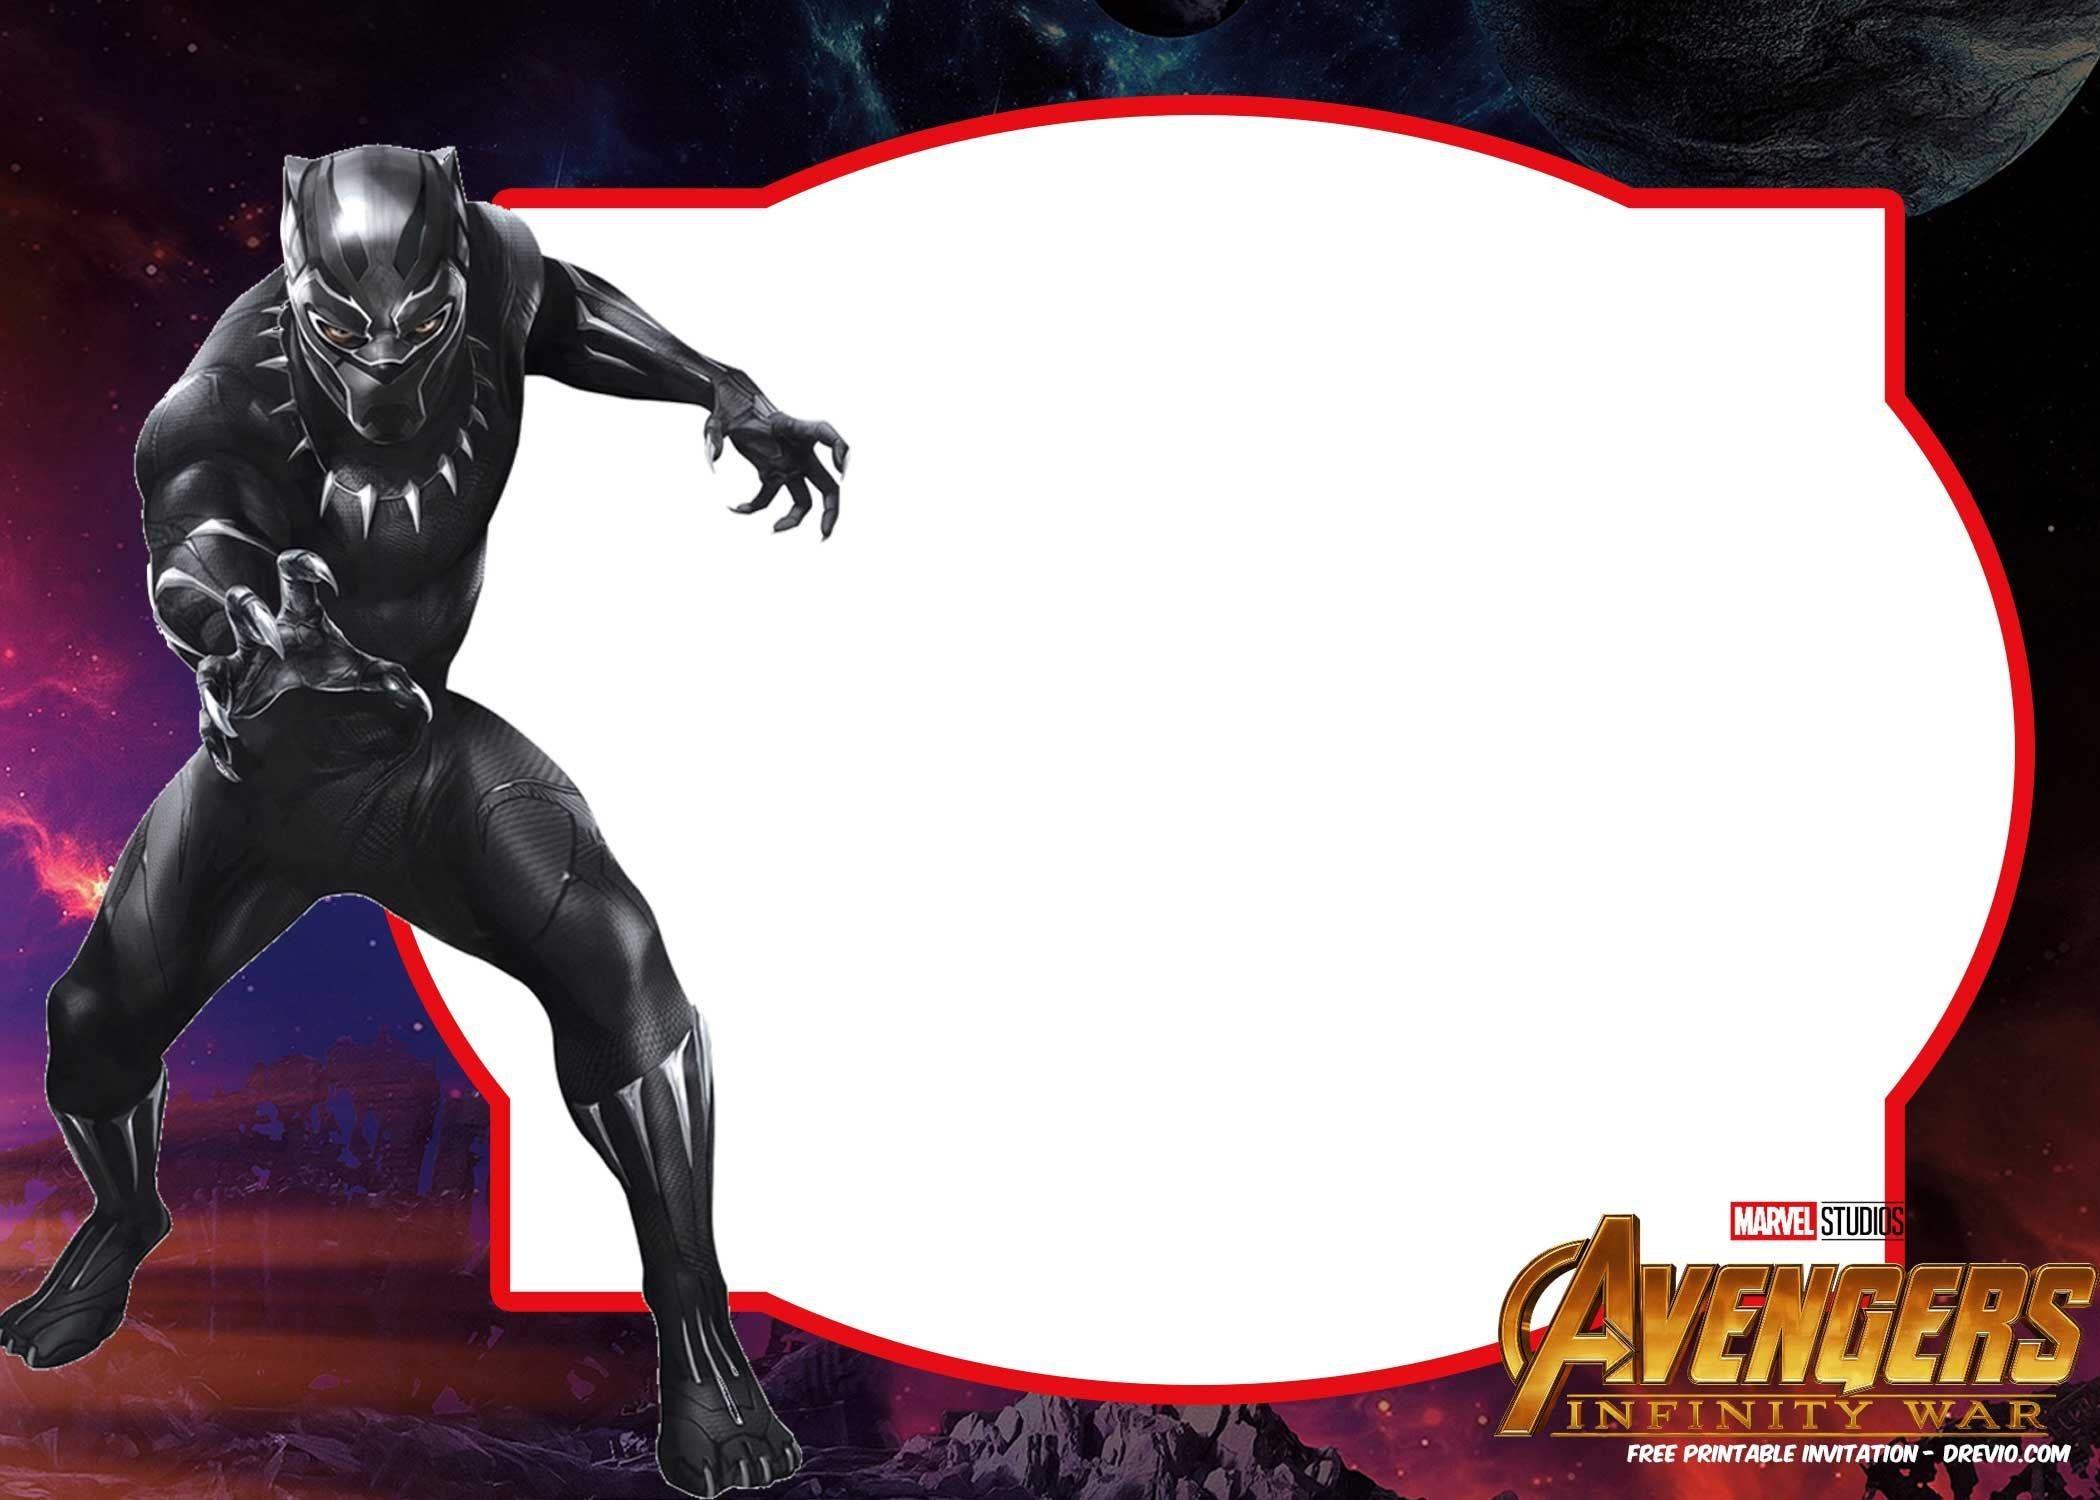 Free Avengers Infinity Wars Birthday Invitation Templates - All - Avengers Printable Invitations Free